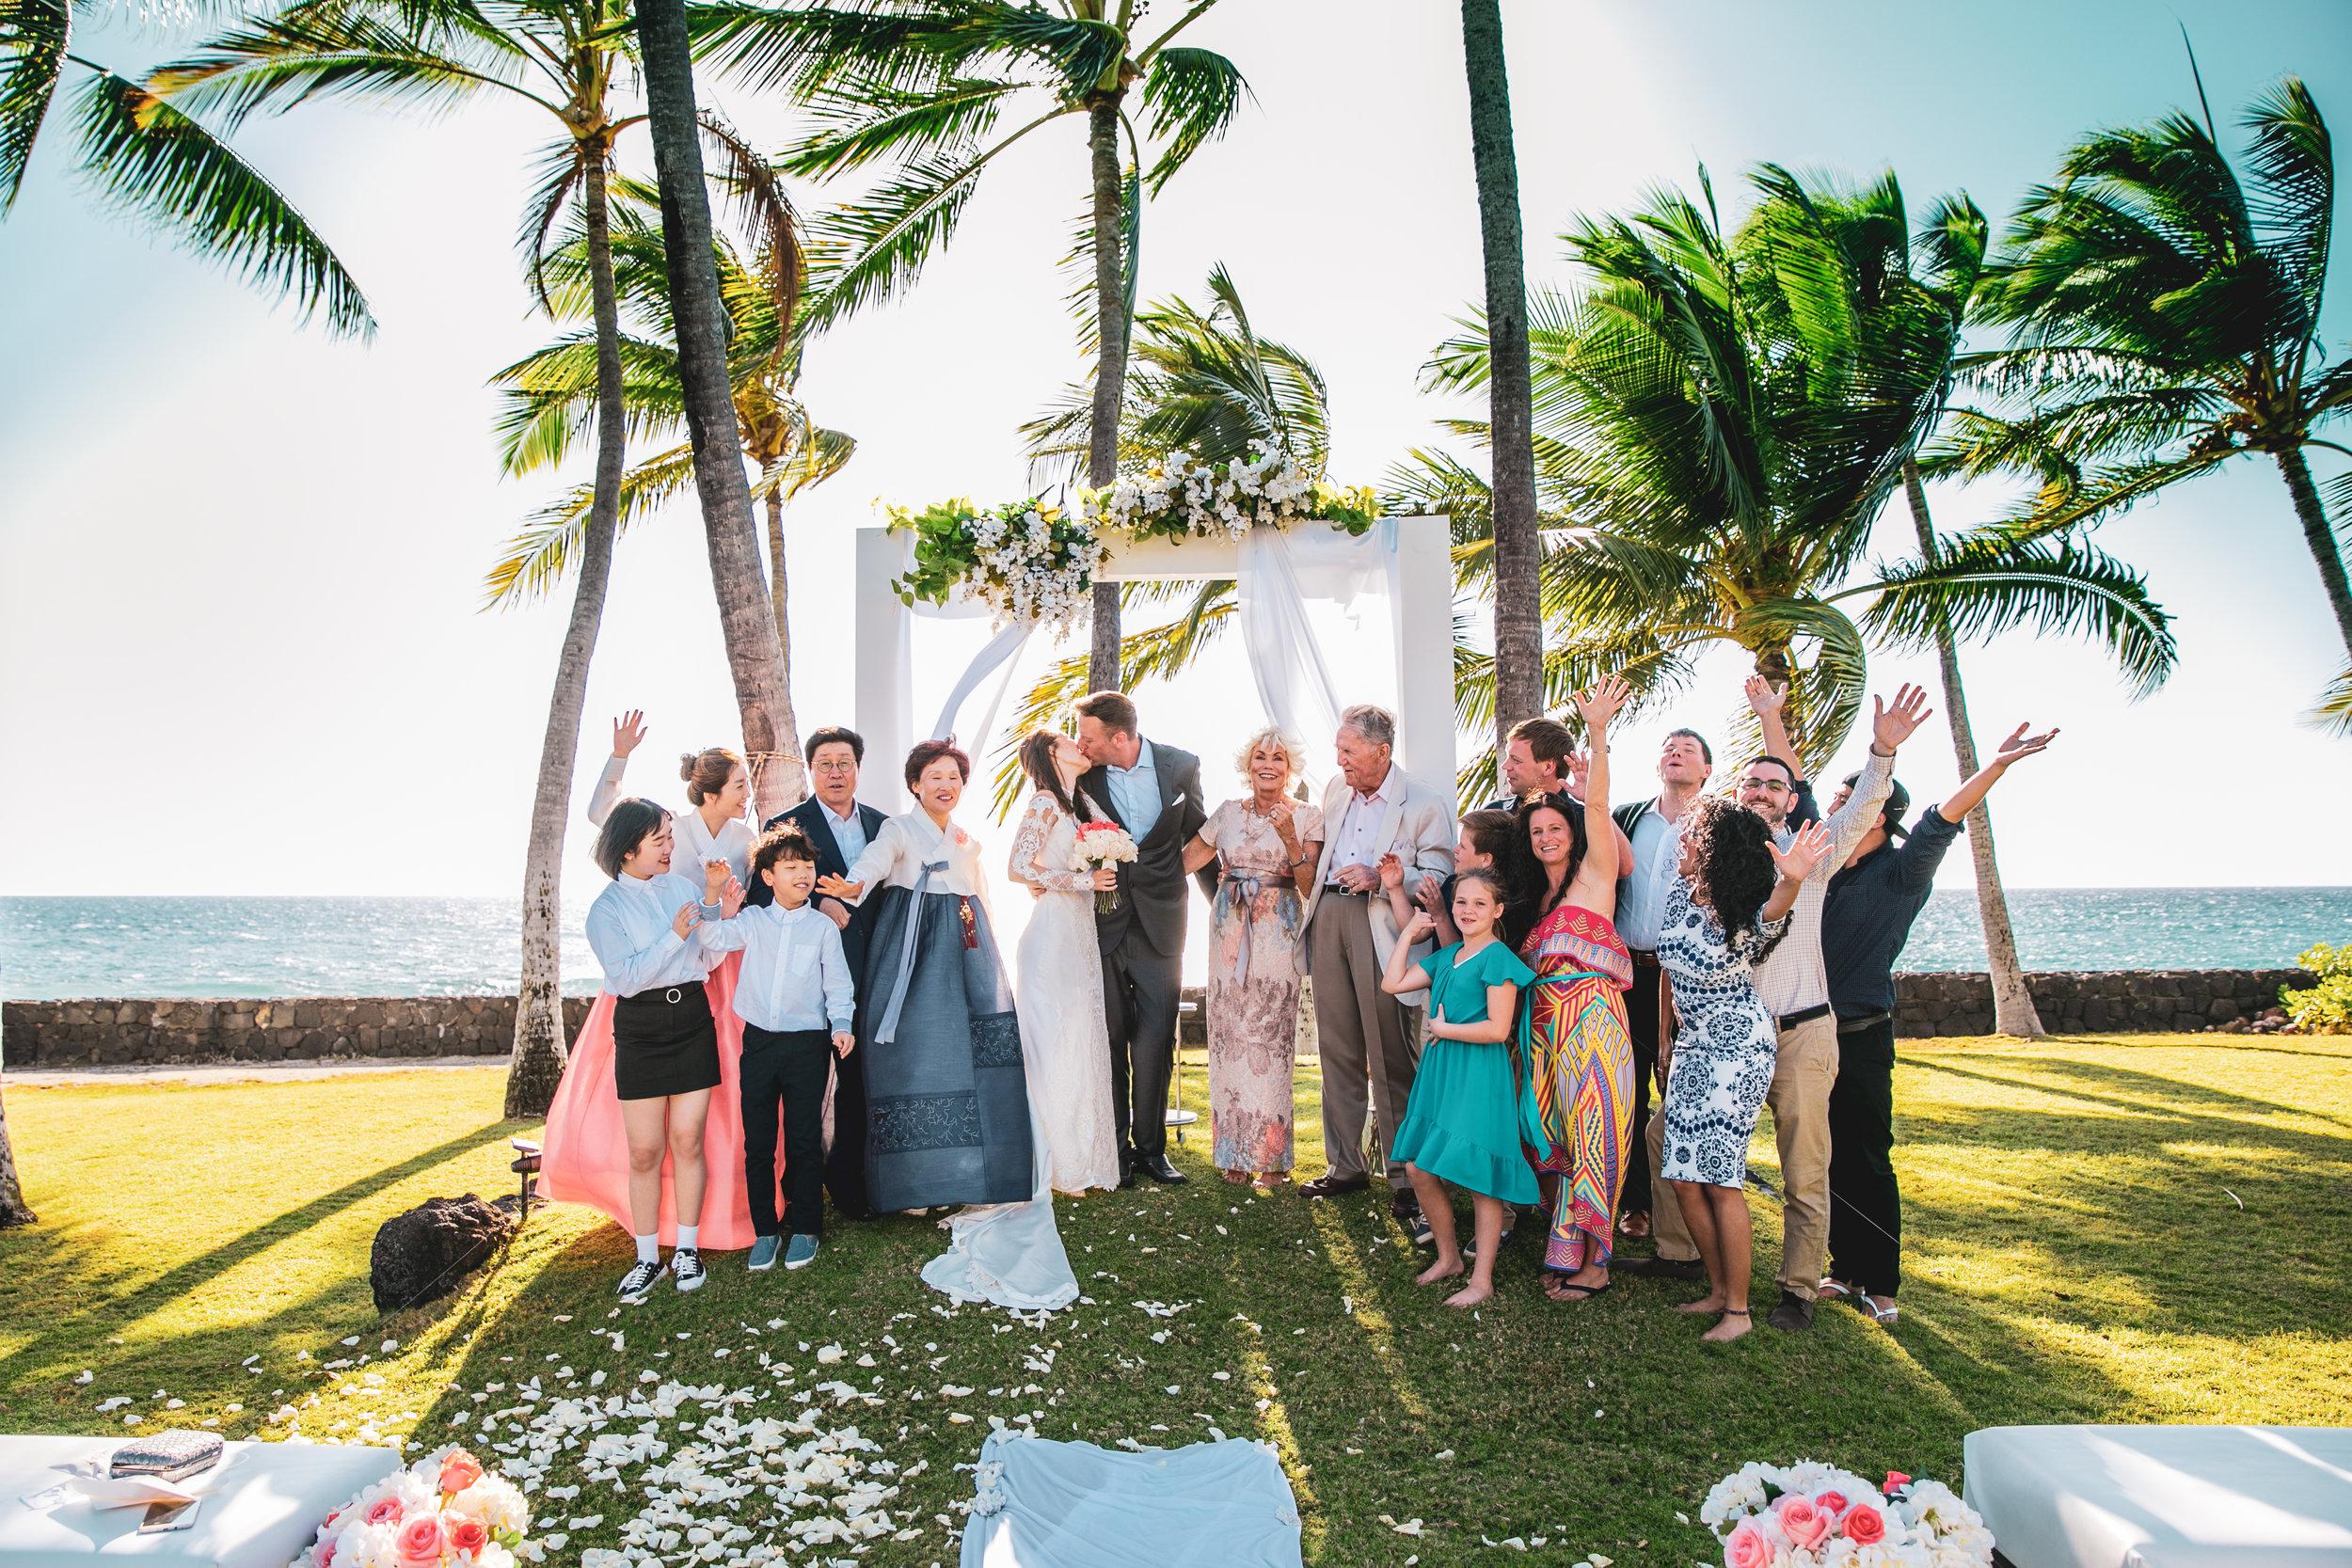 kelilina photography hawaii florida destination wedding photographer-41.jpg